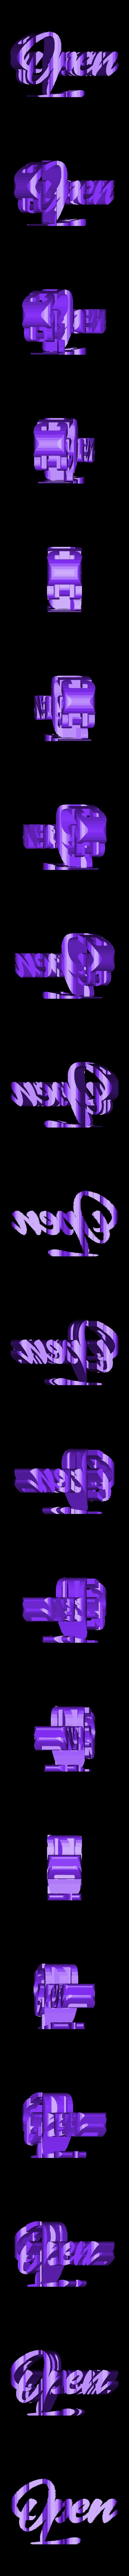 OPEN_CLOSE.stl Download STL file OPEN/CLOSED Shop sign • 3D printing model, rocknrollah84